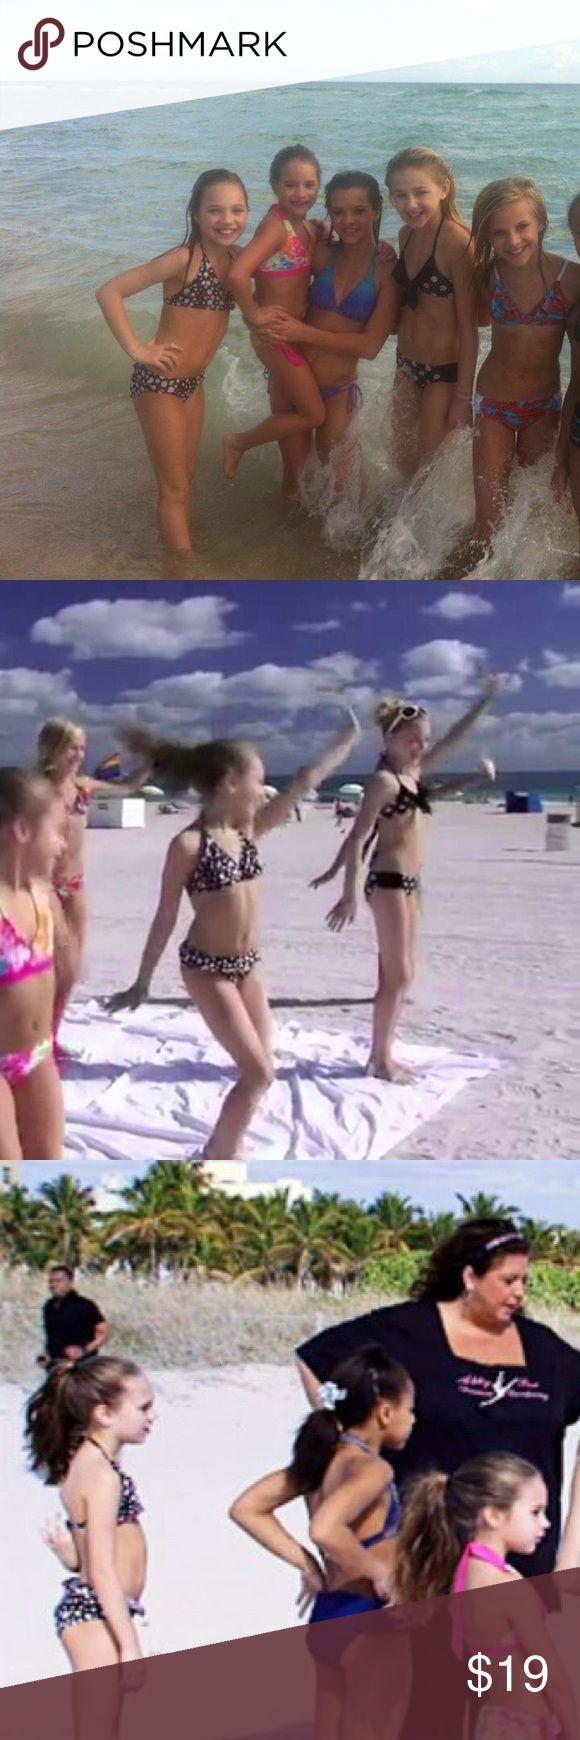 Maddie Ziegler Dance Moms black/white/pink bikini! Exact same style worn by Maddie Ziegler on Dance Moms season 2 episode 10. Pink detailing on ruffles Justice Swim Bikinis